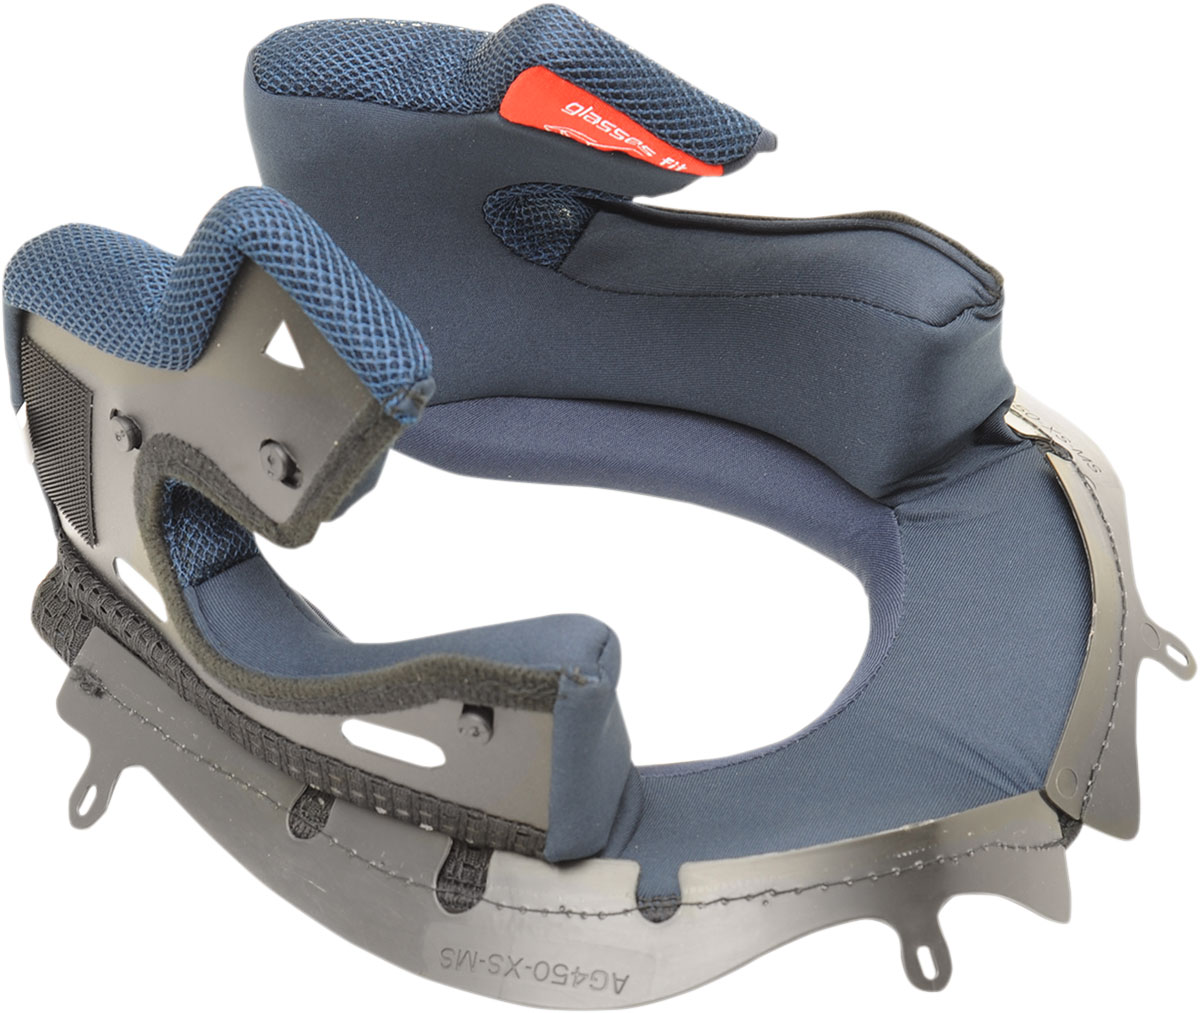 AGV Replacement CHEEKPADS for AGV K5 Helmet